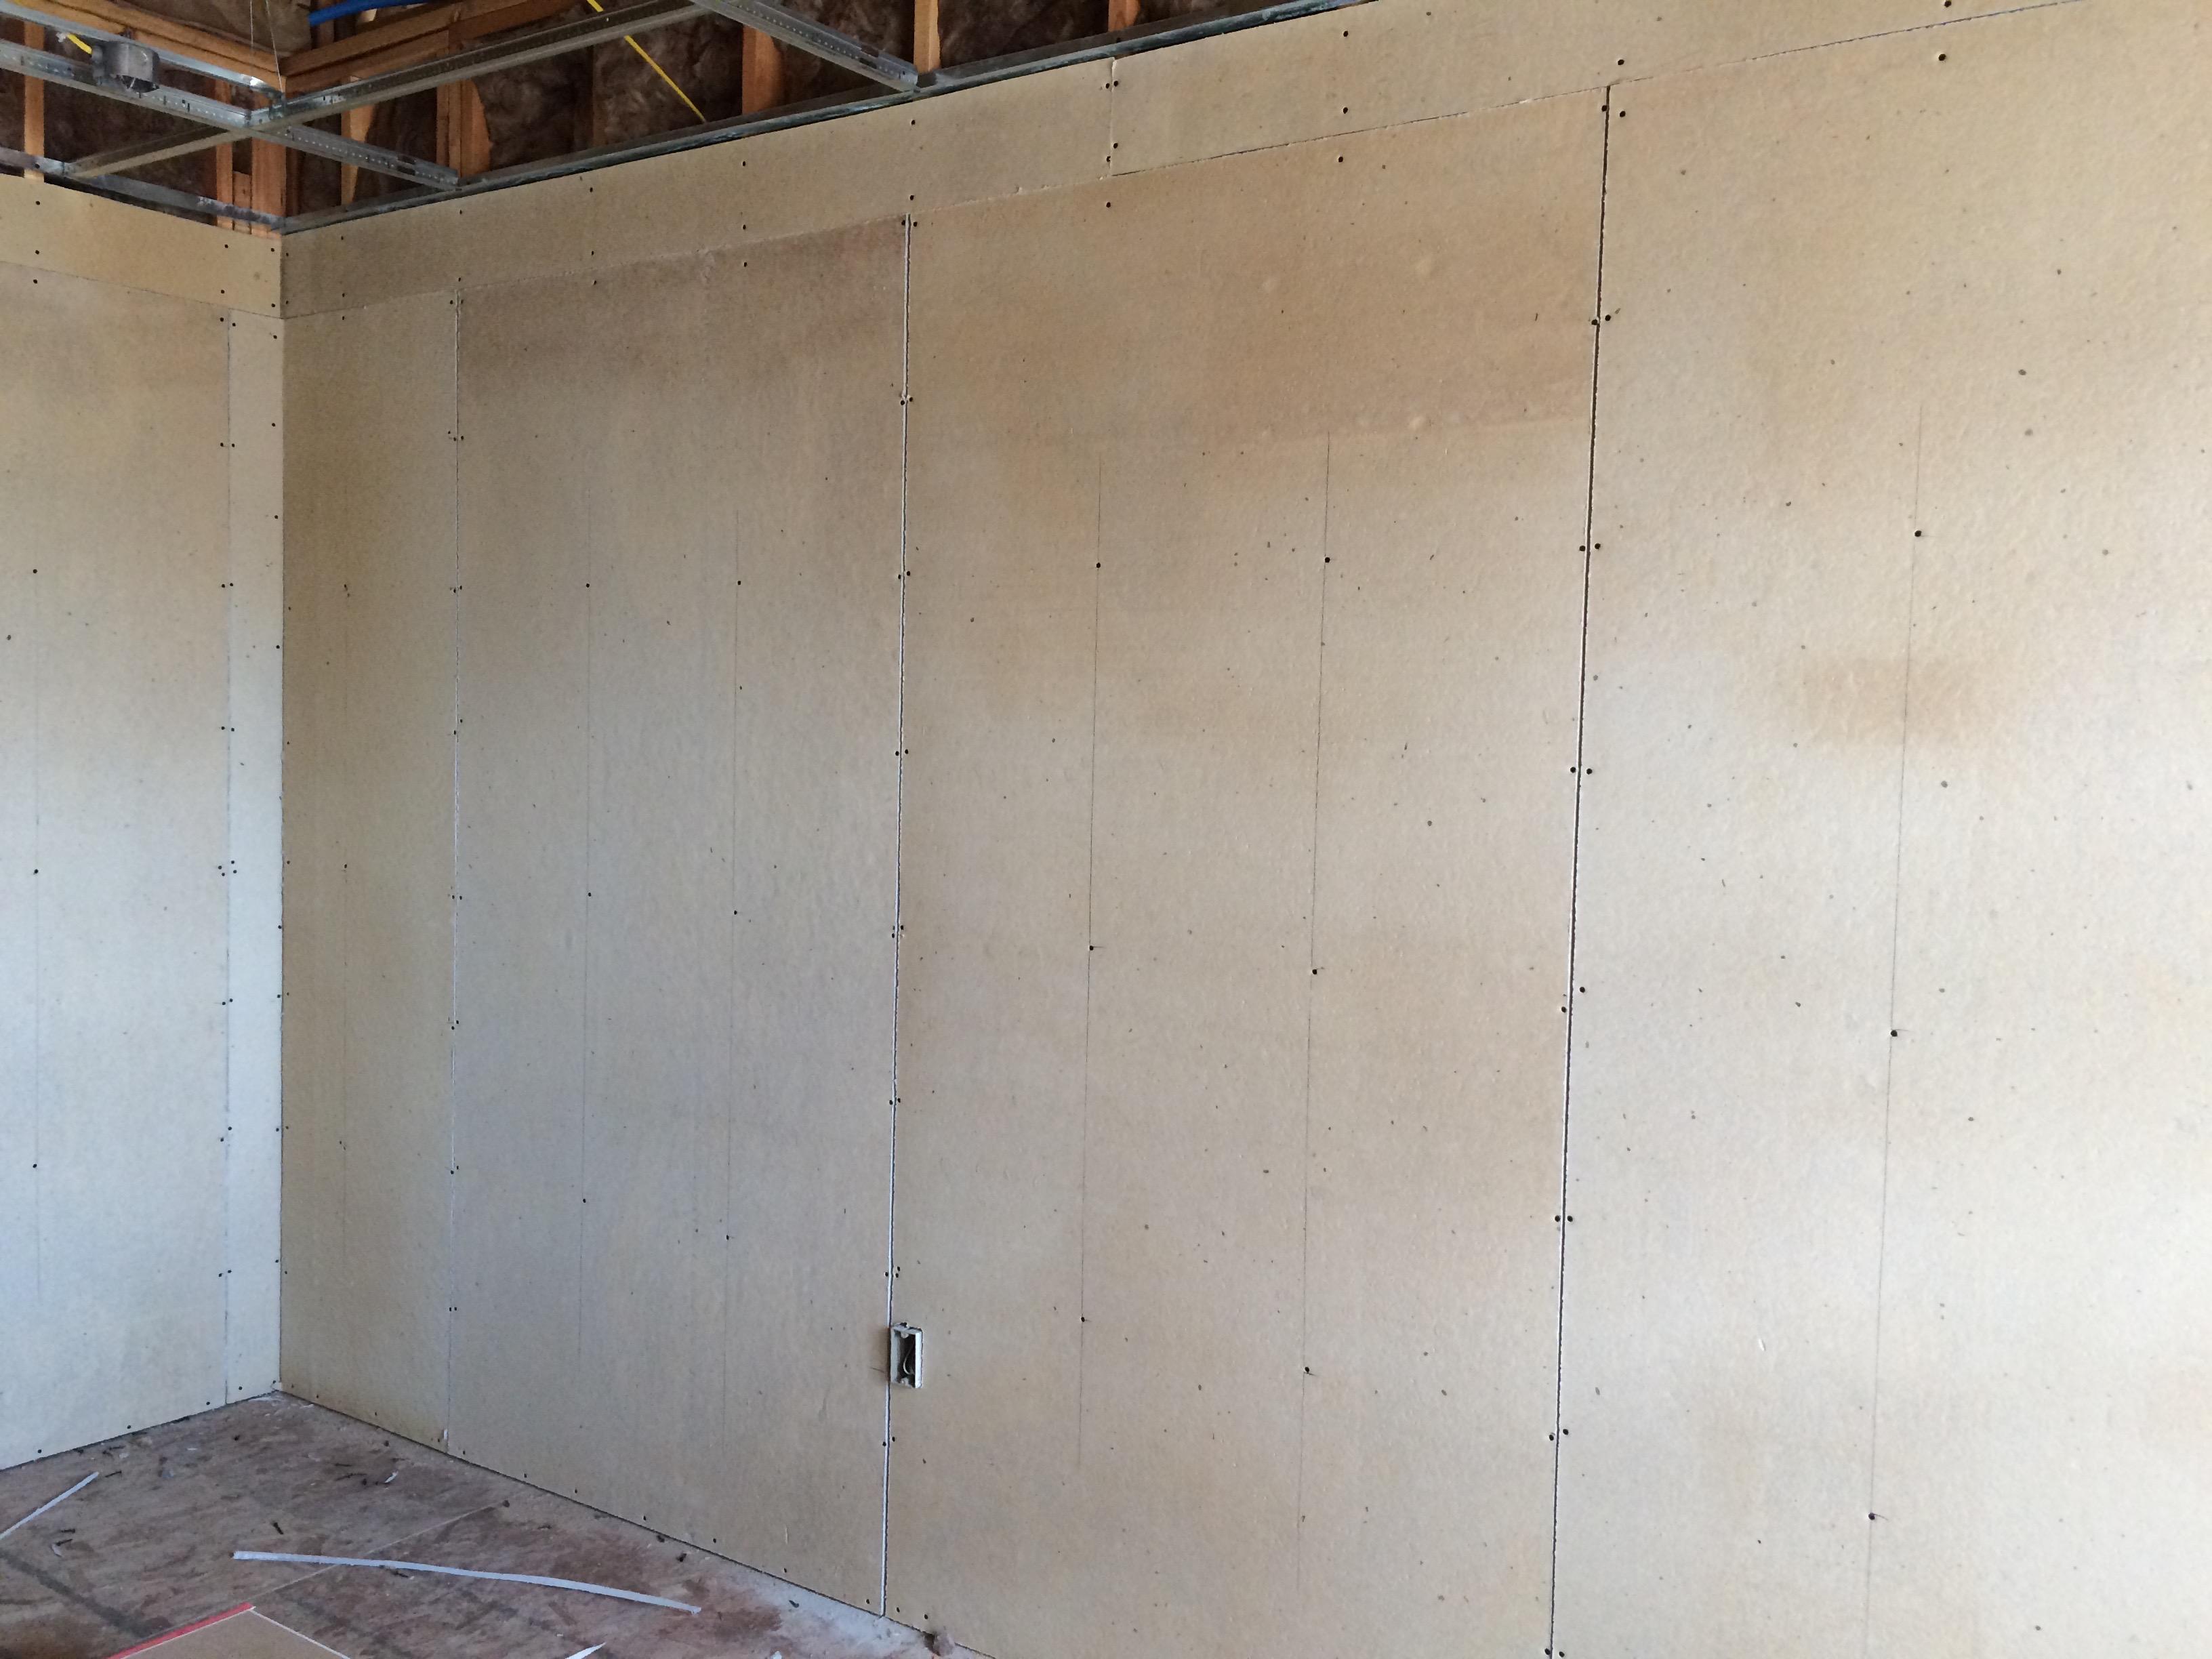 440 SoundBarrier® Sound Barrier in Walls | Modern Materials